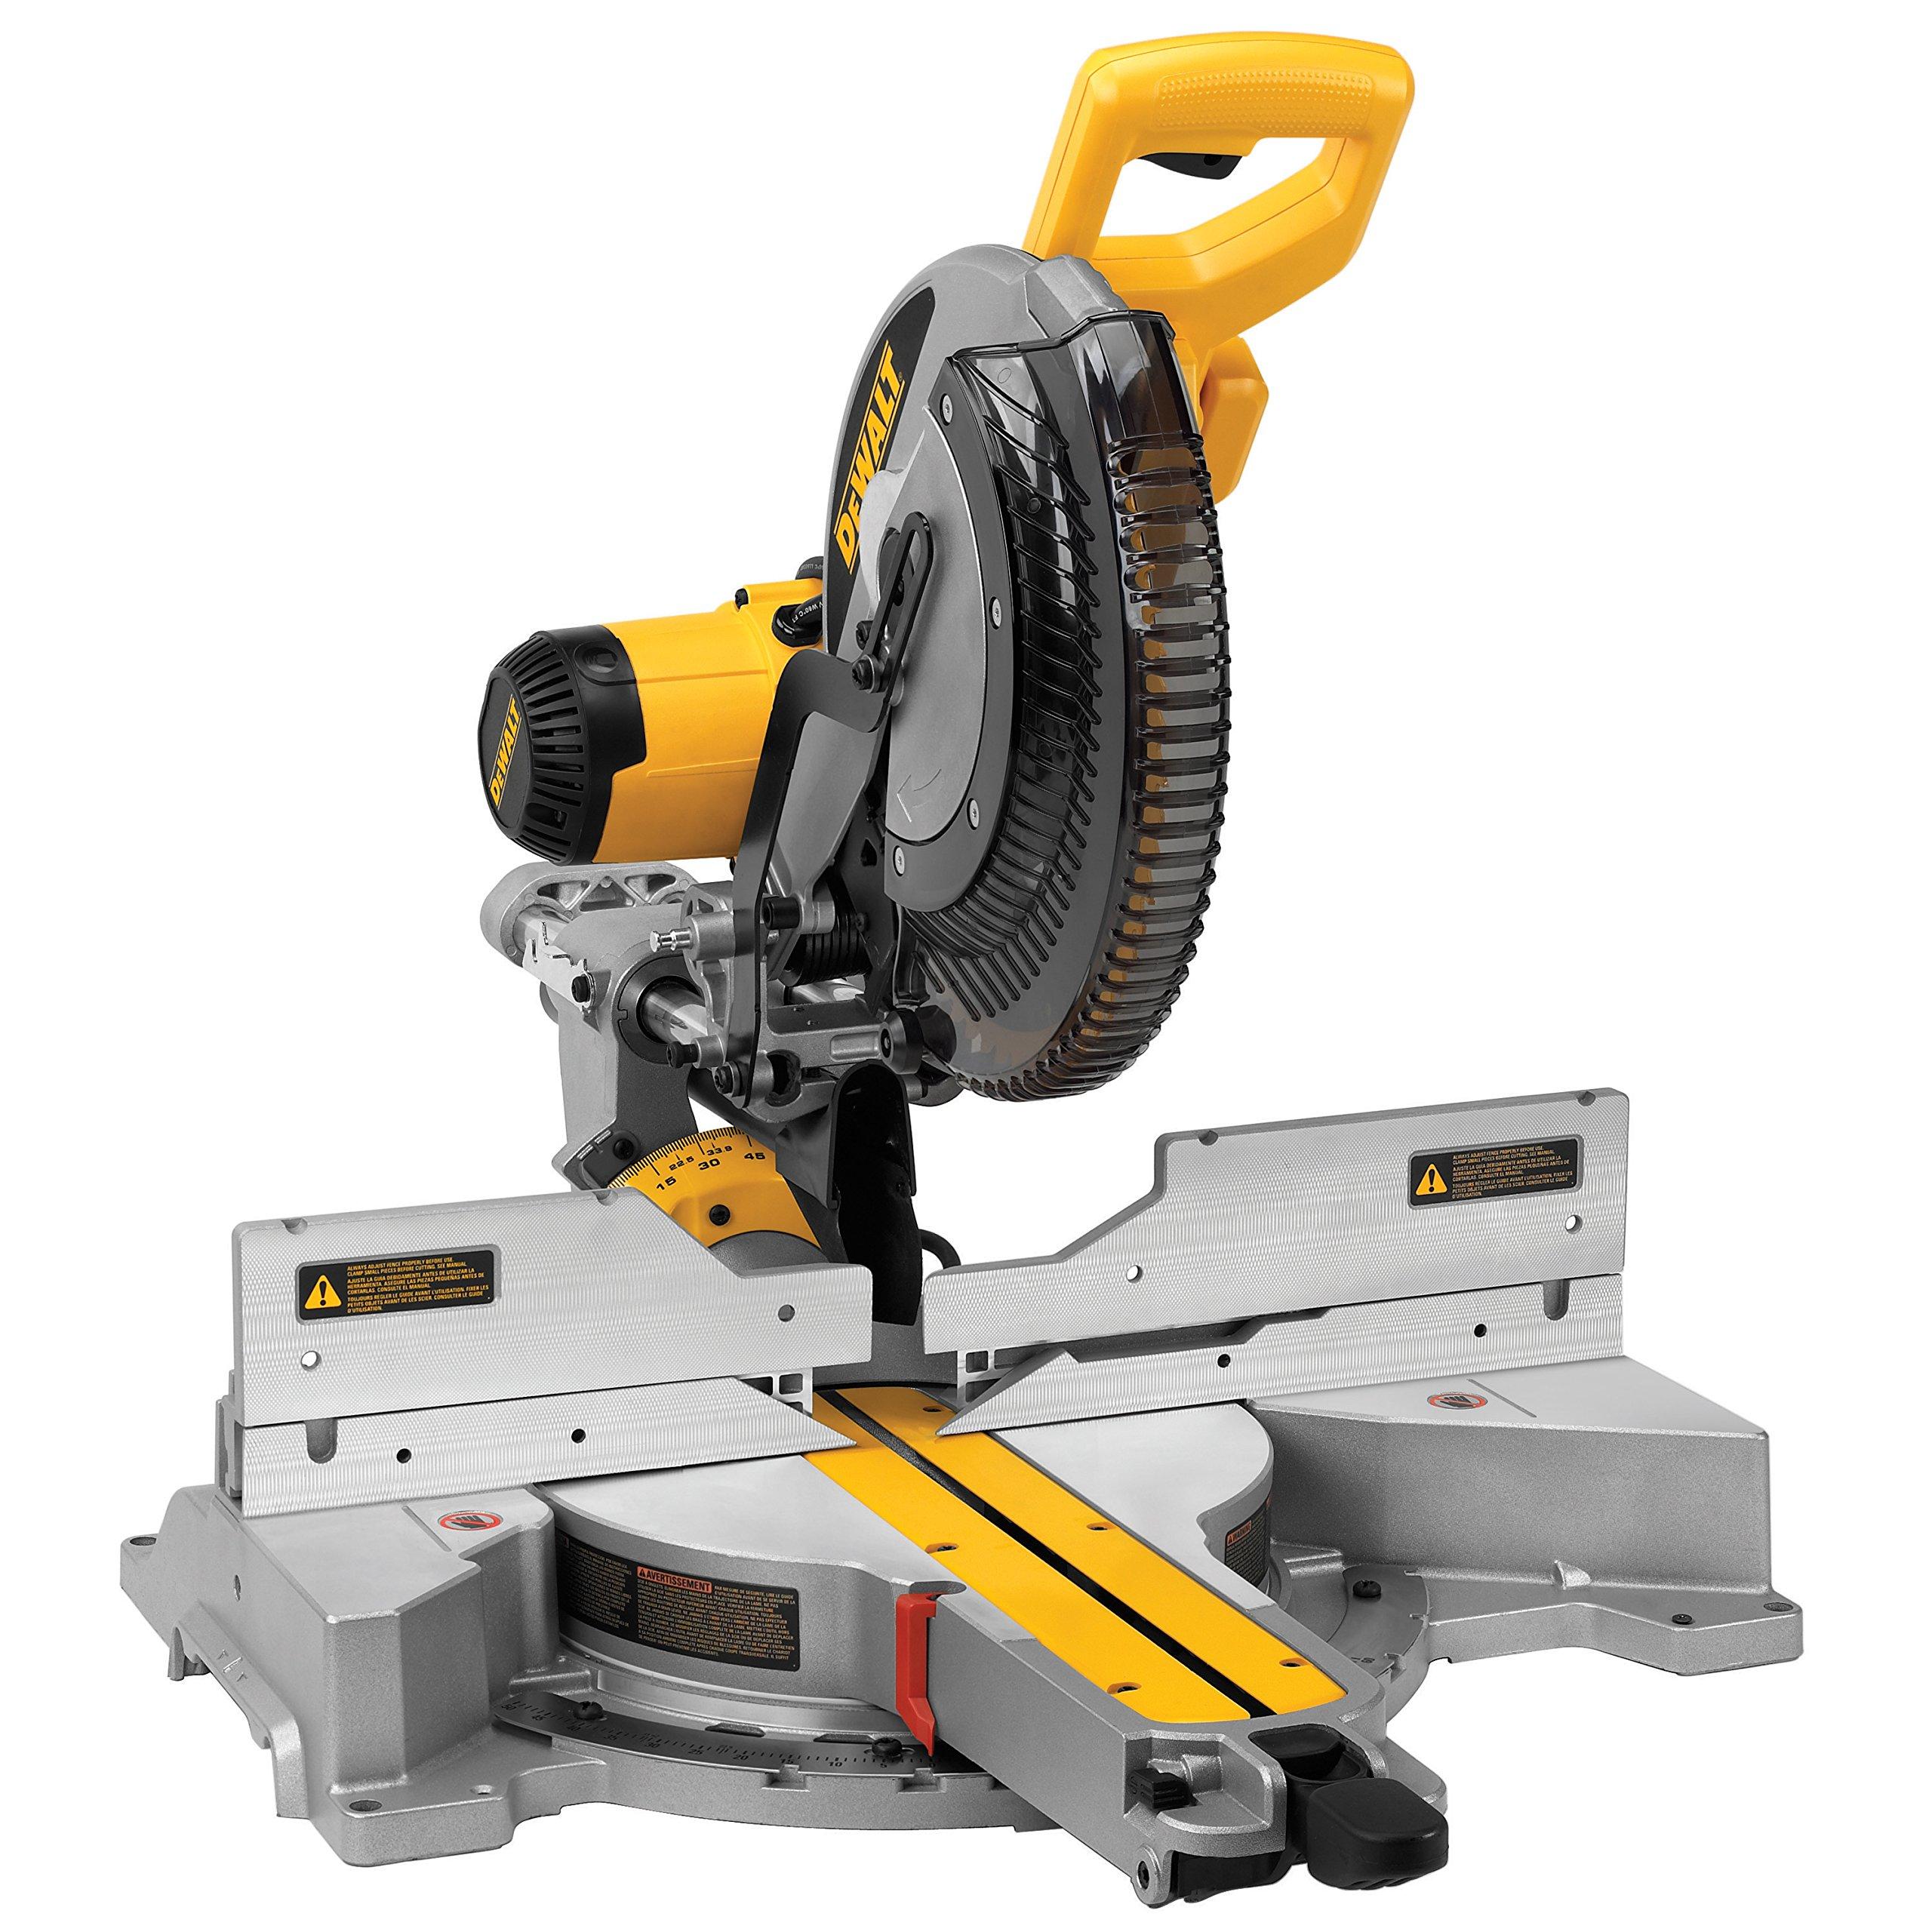 Best rated in power miter saws helpful customer reviews amazon dewalt dws780 12 inch double bevel sliding compound miter saw greentooth Gallery